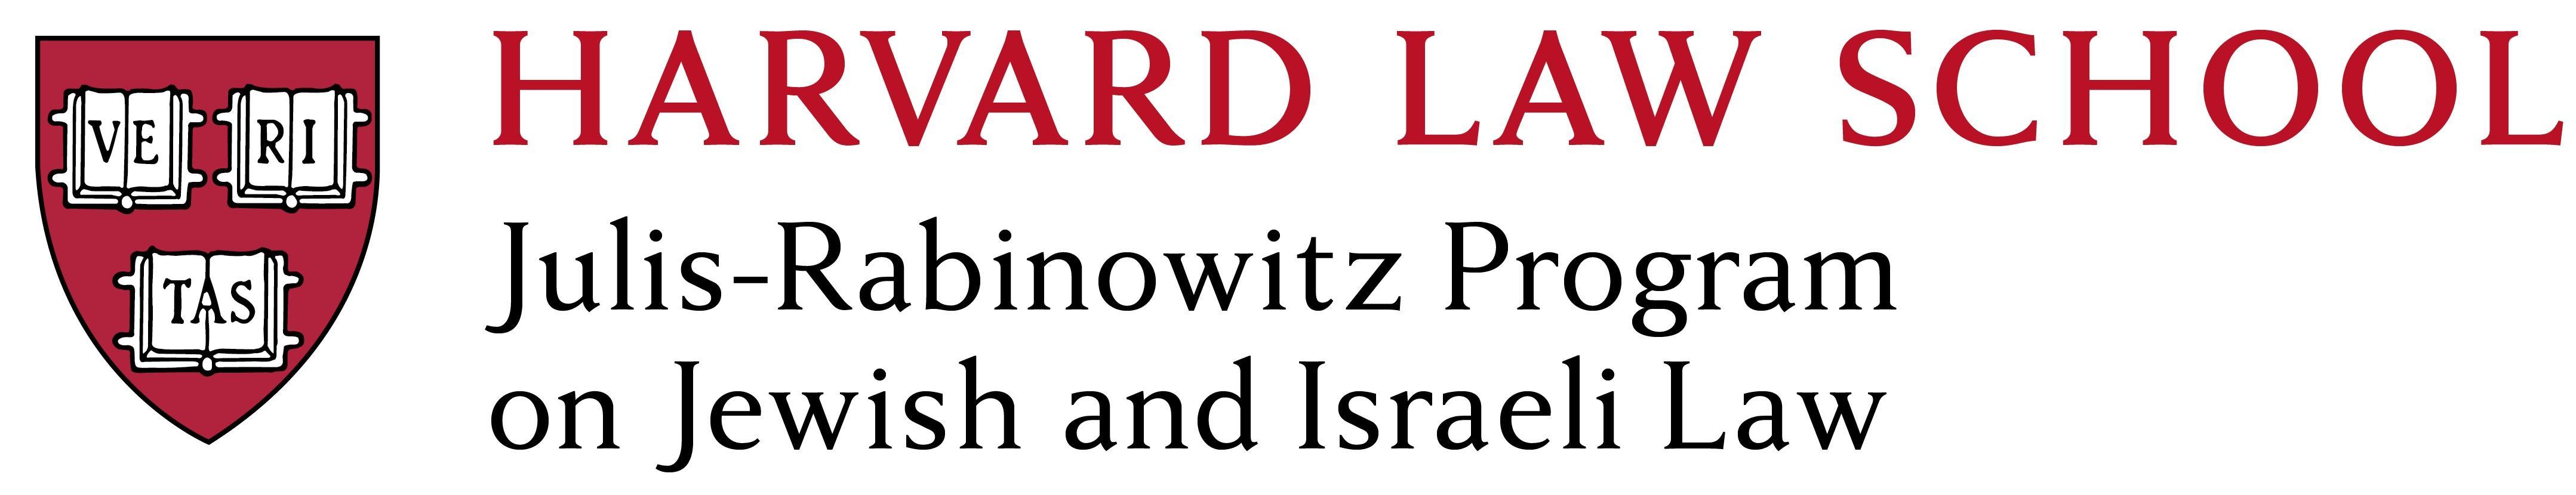 Julis-Rabinowitz Program on Jewish and Israeli Law